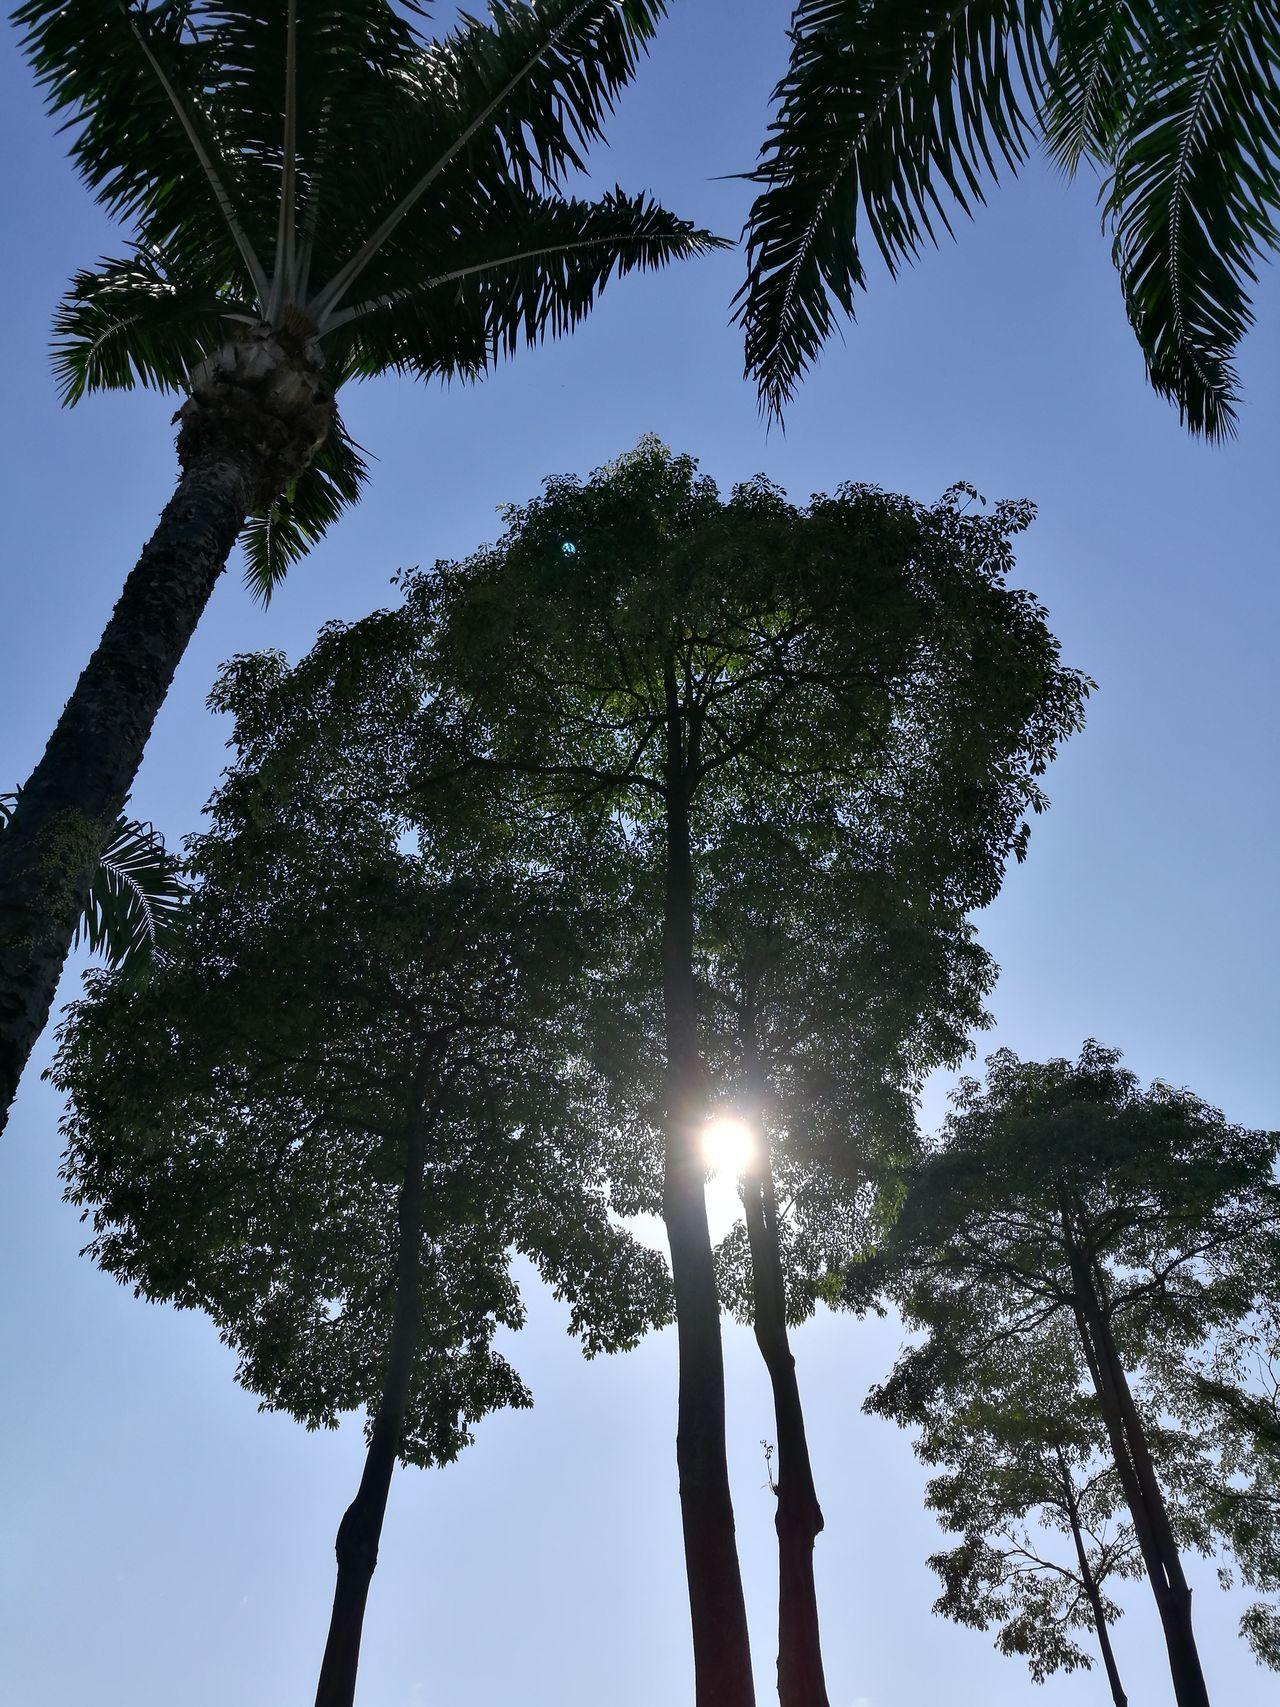 In Shades Sunlight Beaming Through Leaves Walk Under The Sun Johor Bahru